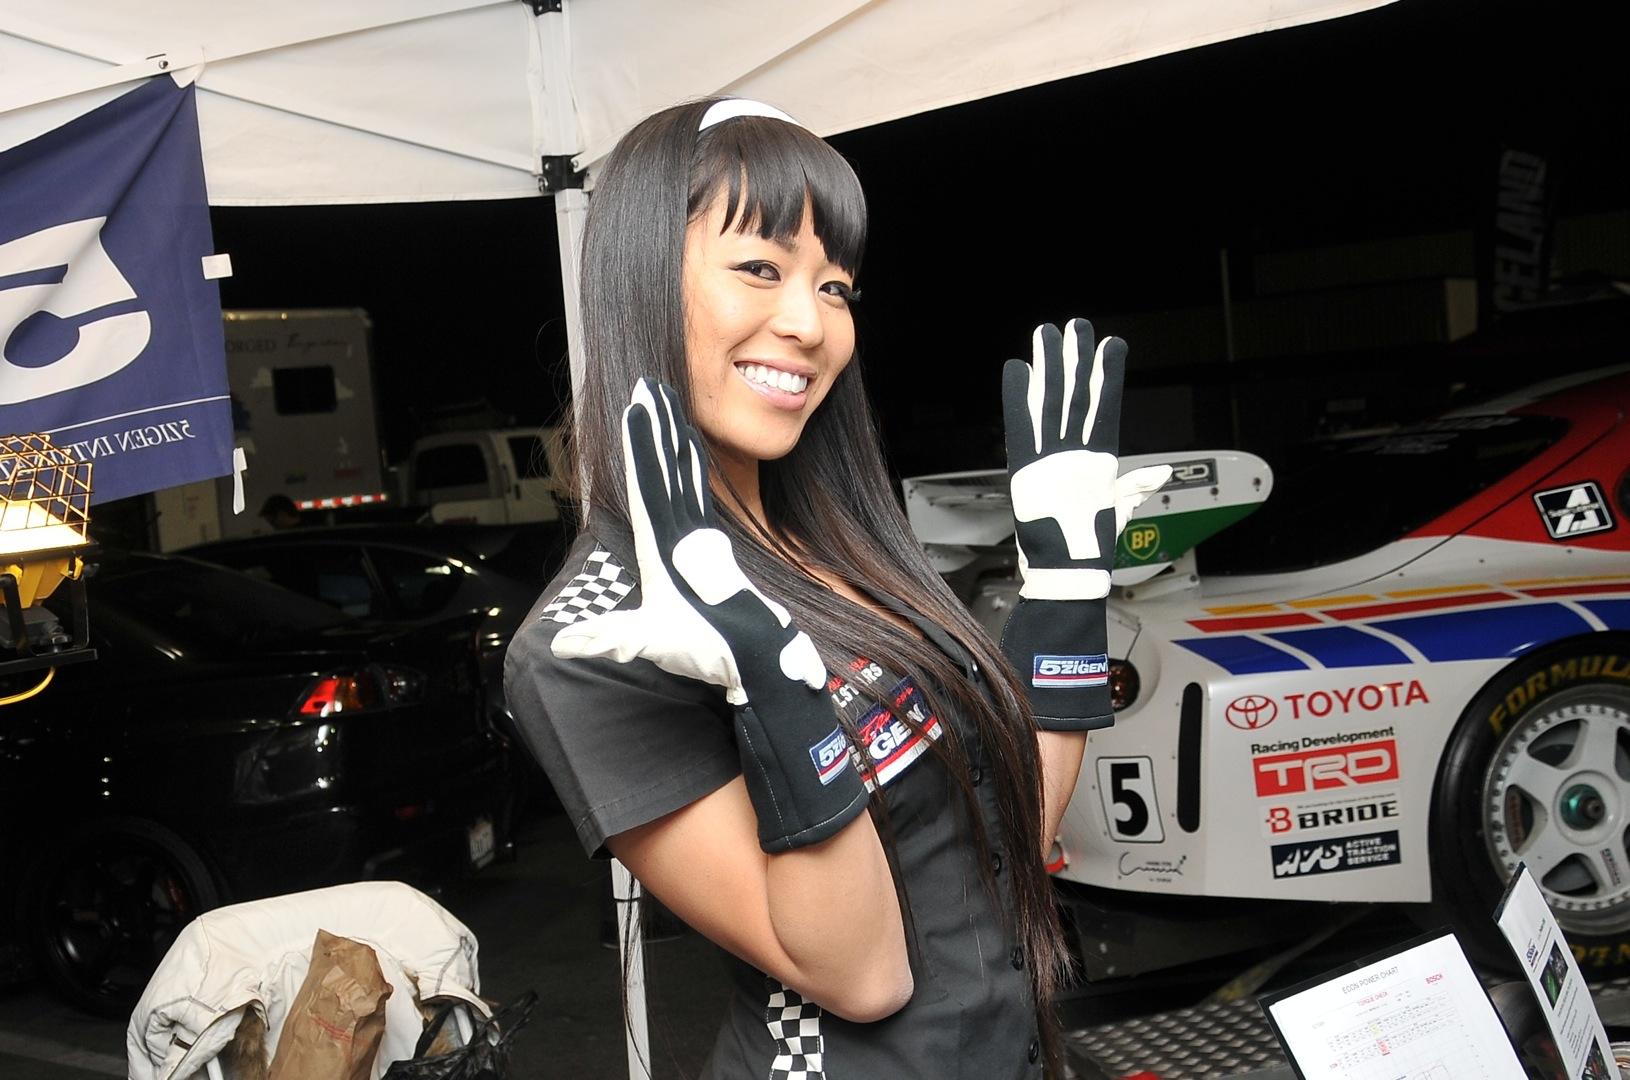 5zigen, Eri, model, racing gloves, gymkhana